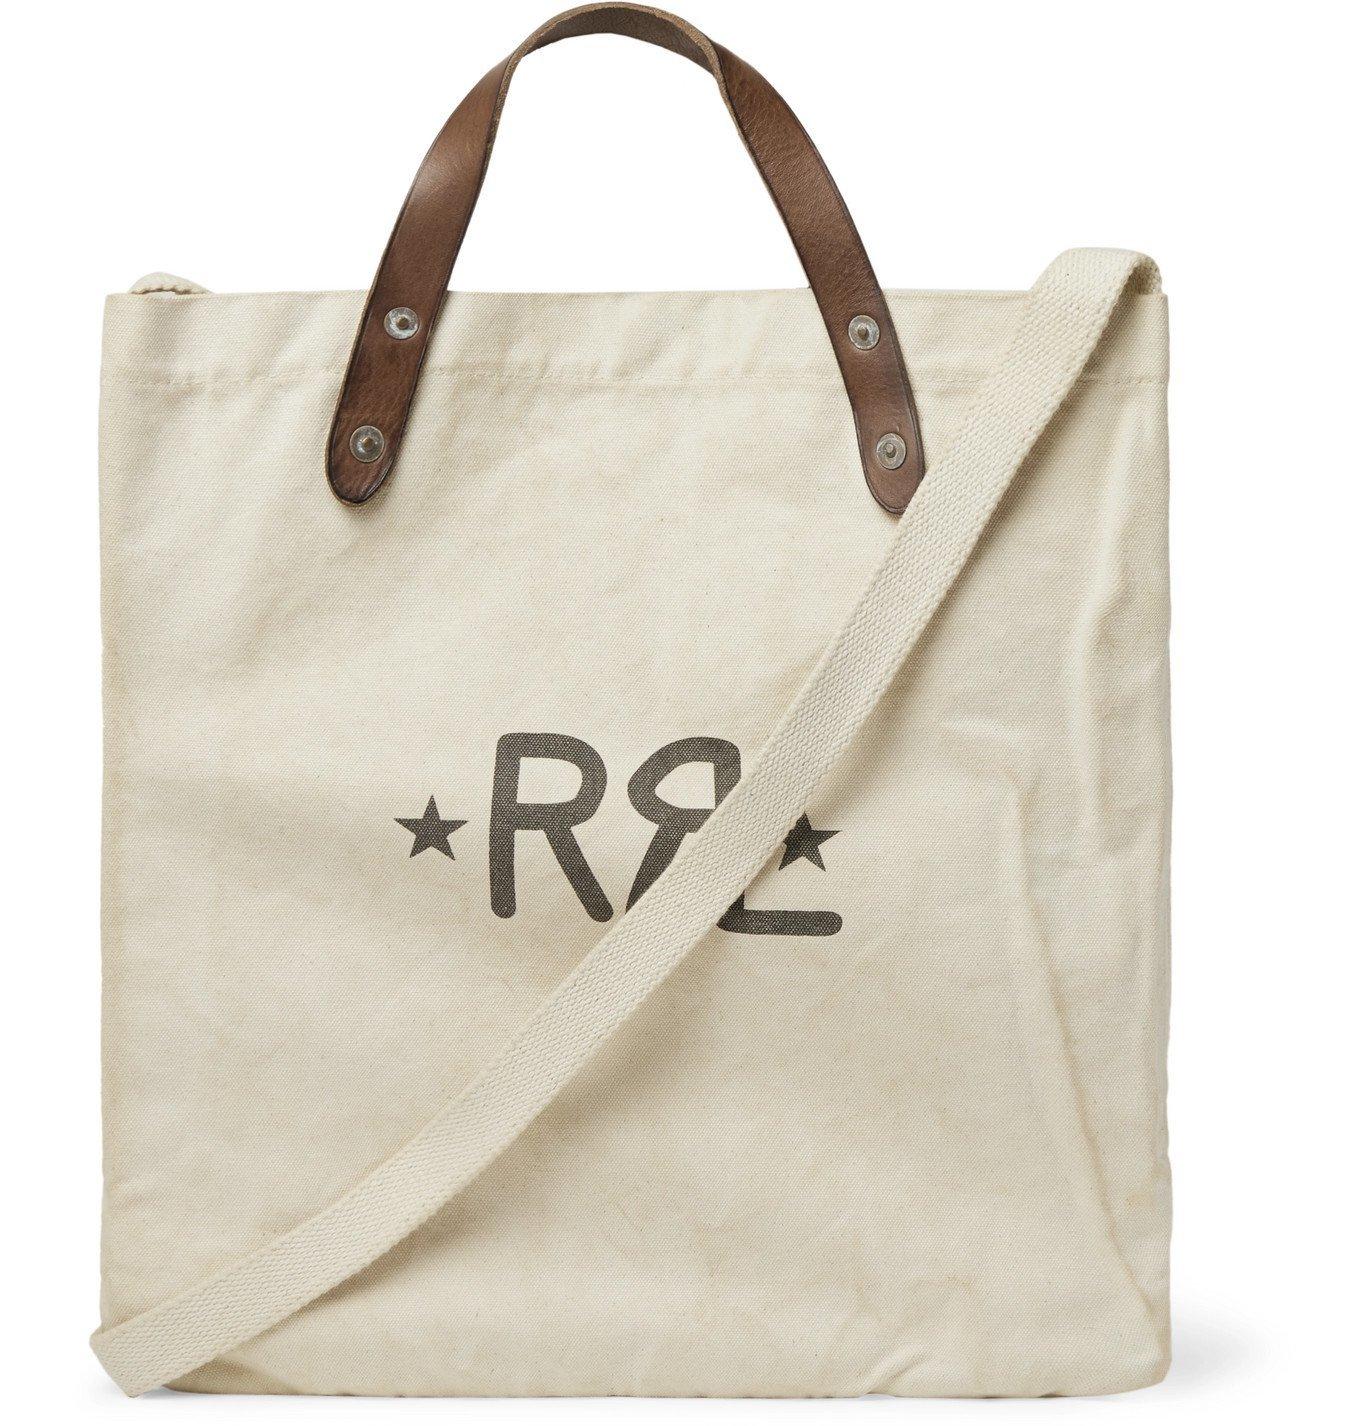 RRL - Leather-Trimmed Logo-Print Cotton-Canvas Tote Bag - Neutrals